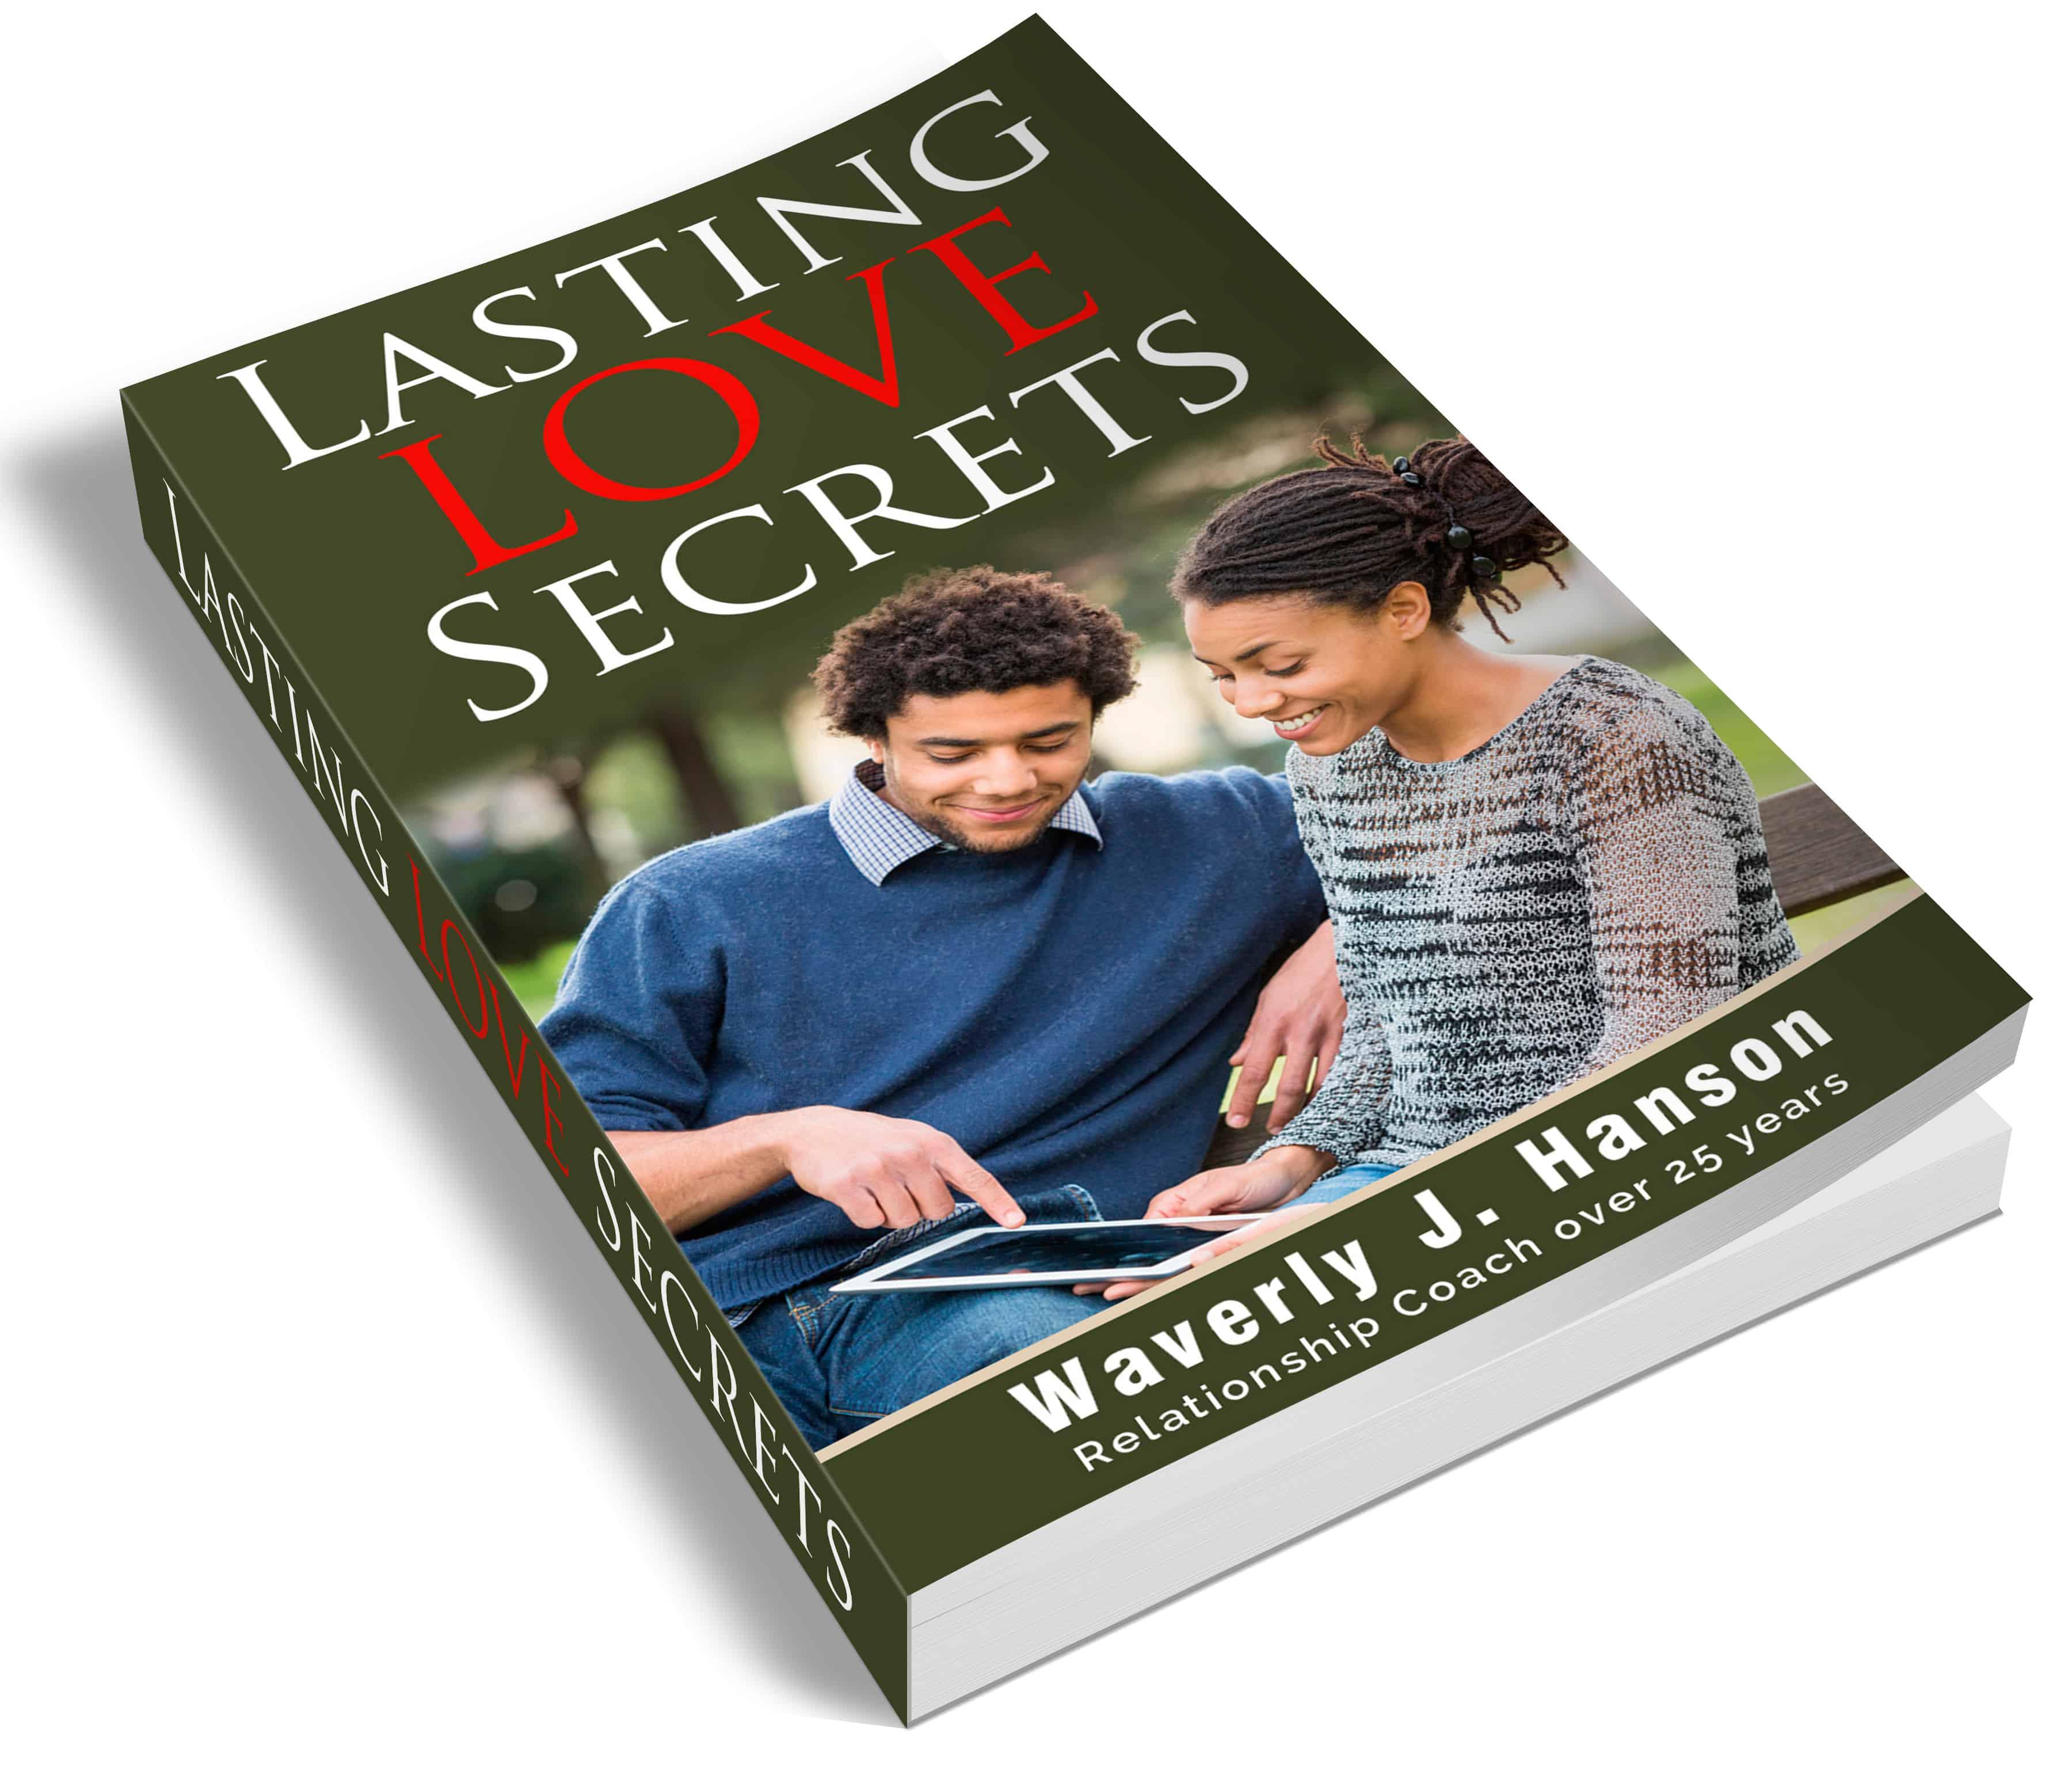 Download Lasting Love Secrets